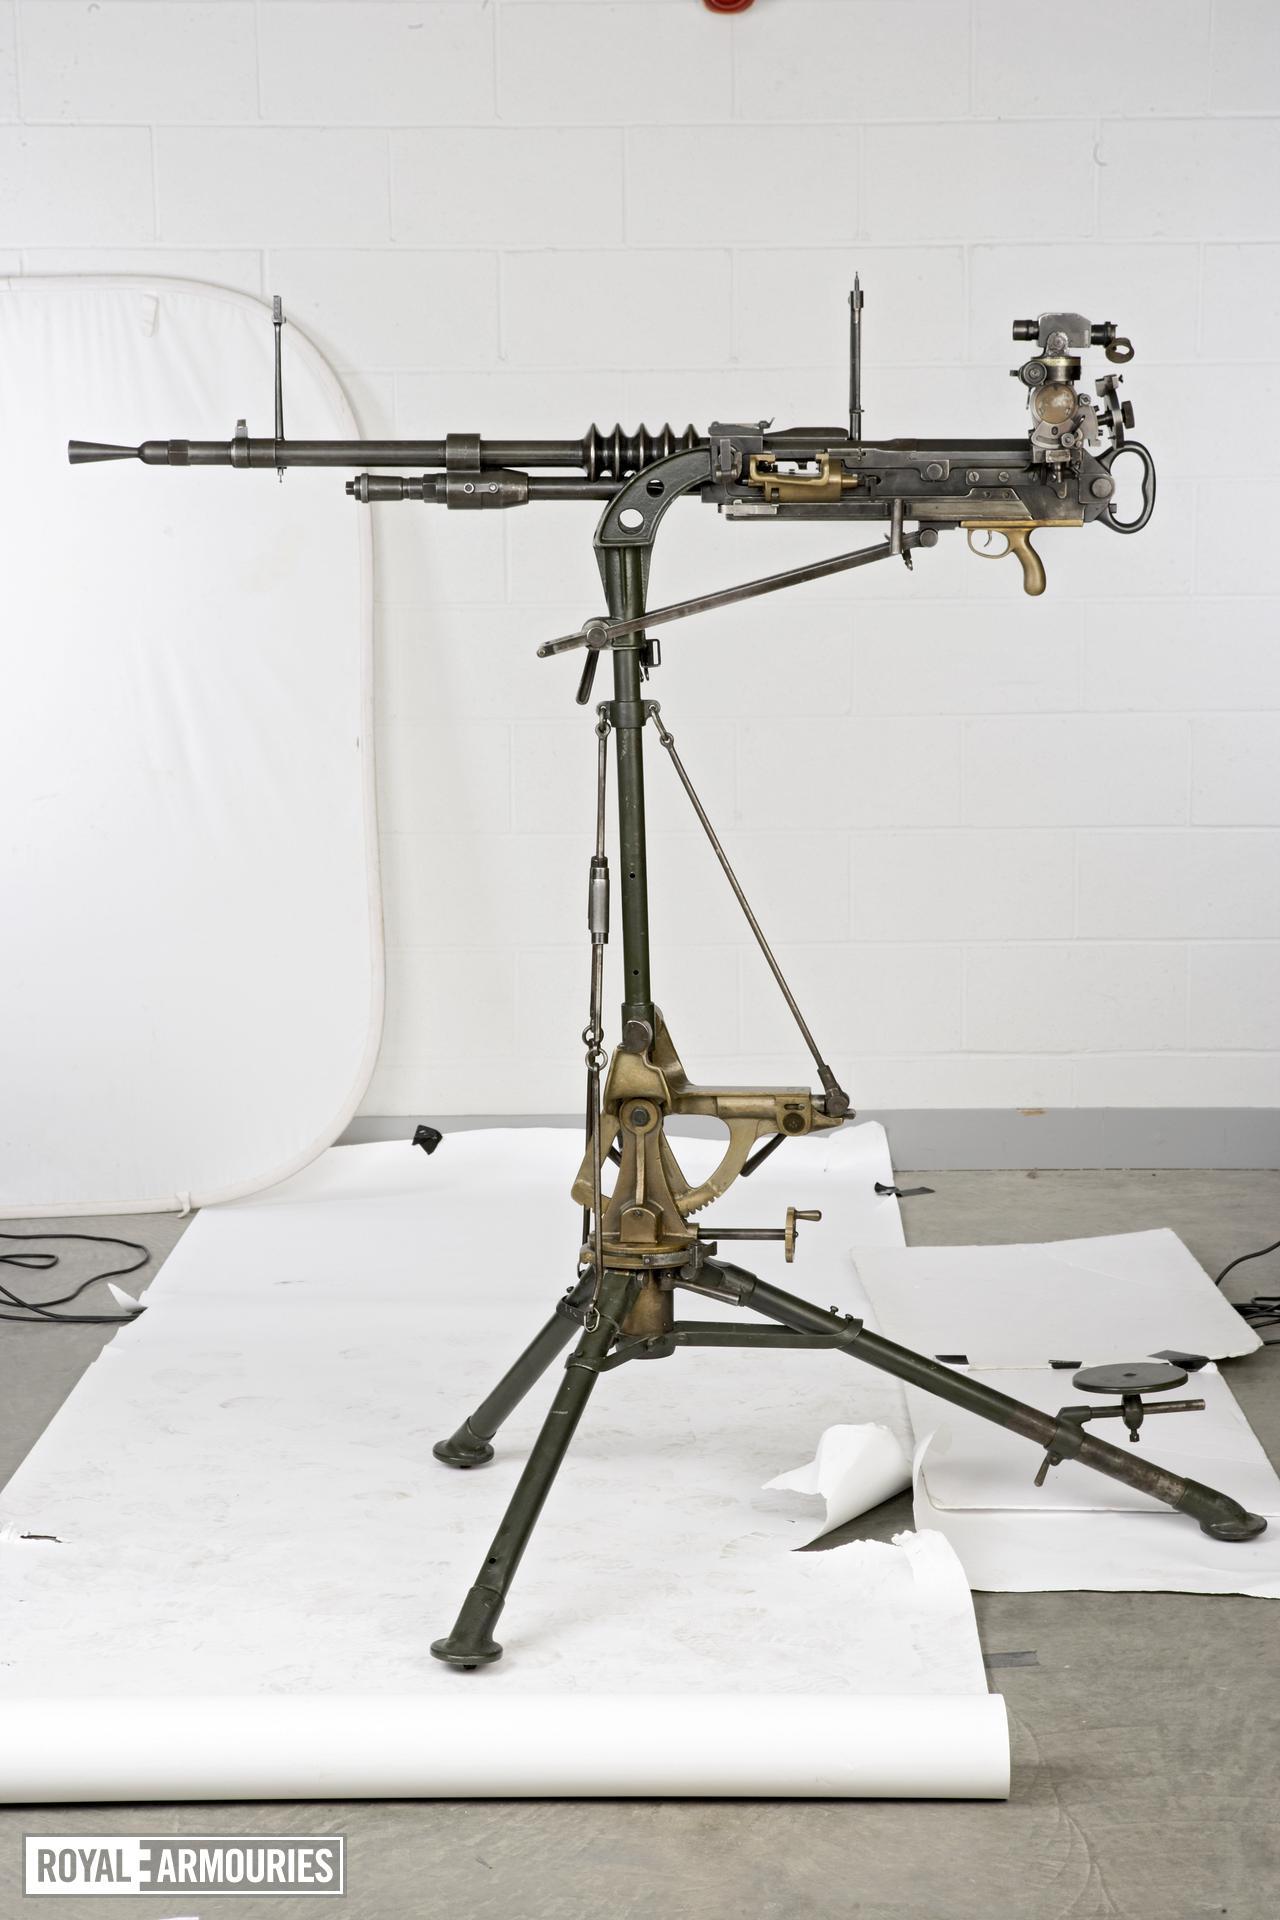 Hotchkiss gas operated machine gun, manufactured by FN, Lige, Belgium